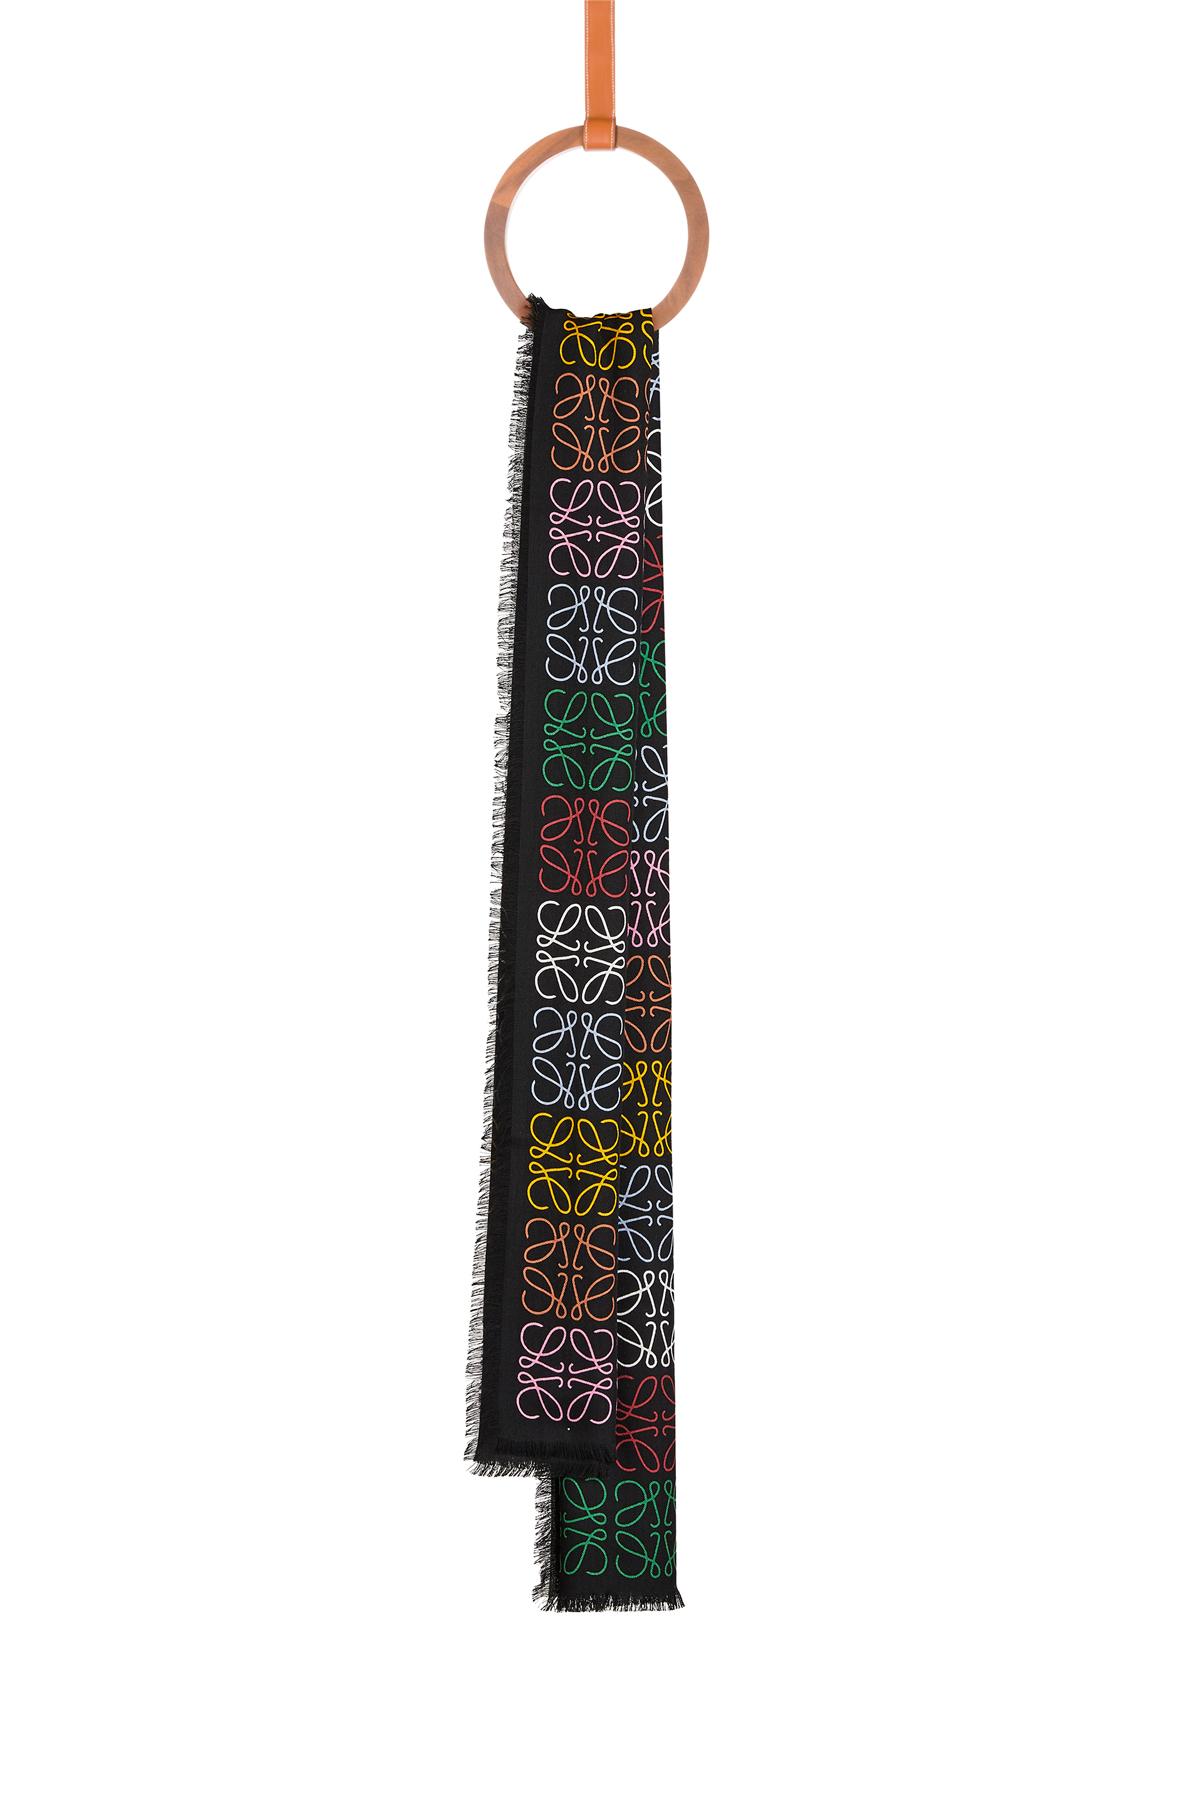 LOEWE 45X200 Scarf Anagram In Lines Multicolor/Black front